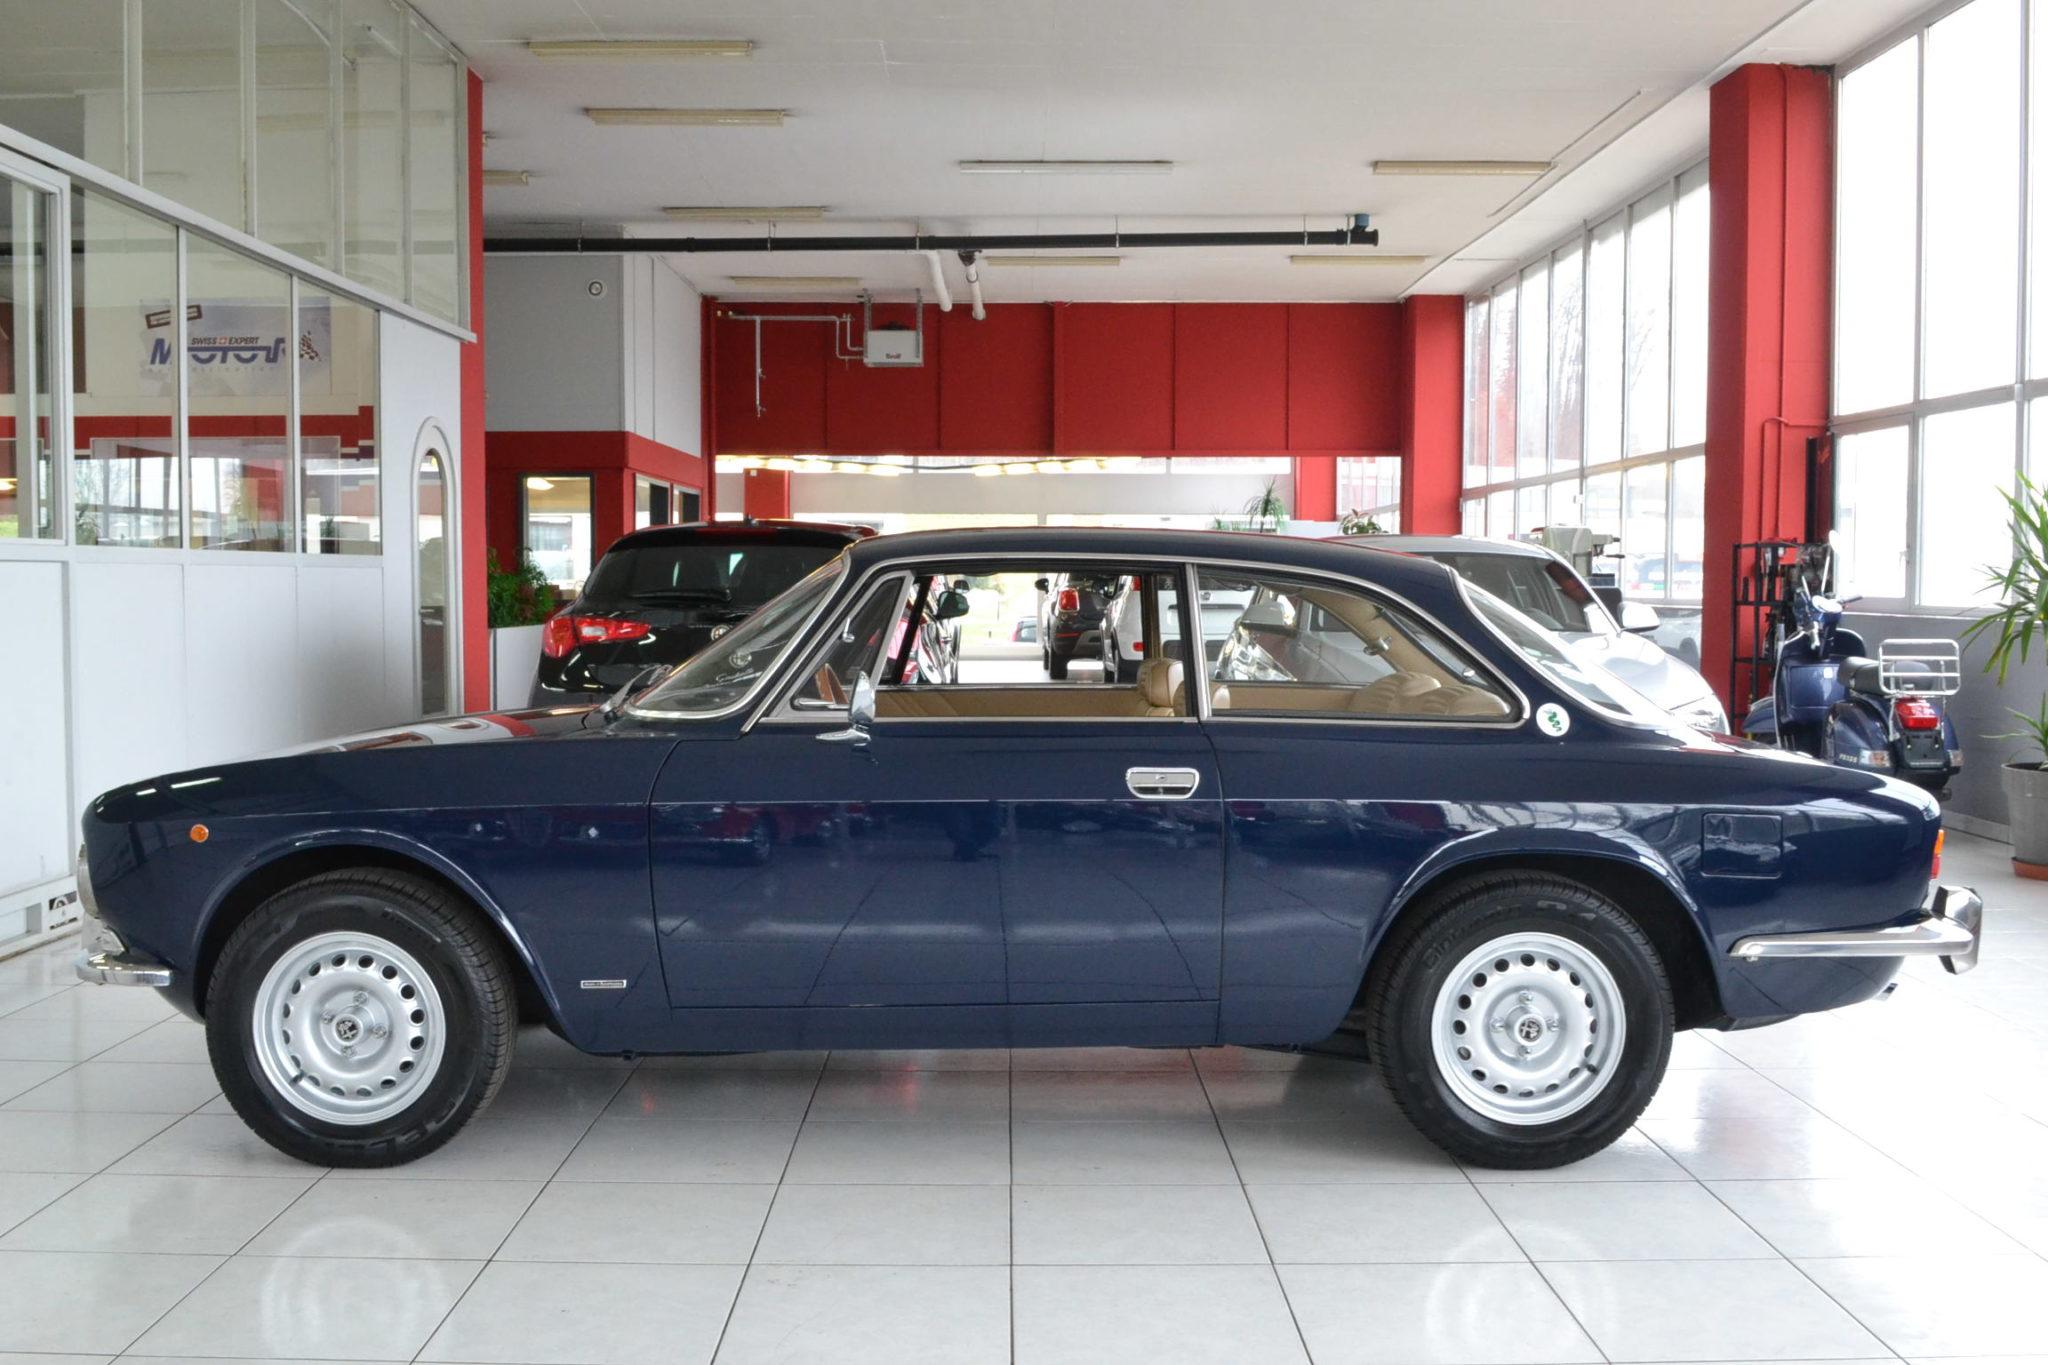 Alfa romeo gt 2000 veloce blu olandese garage vecchio for Garage alfa romeo 95